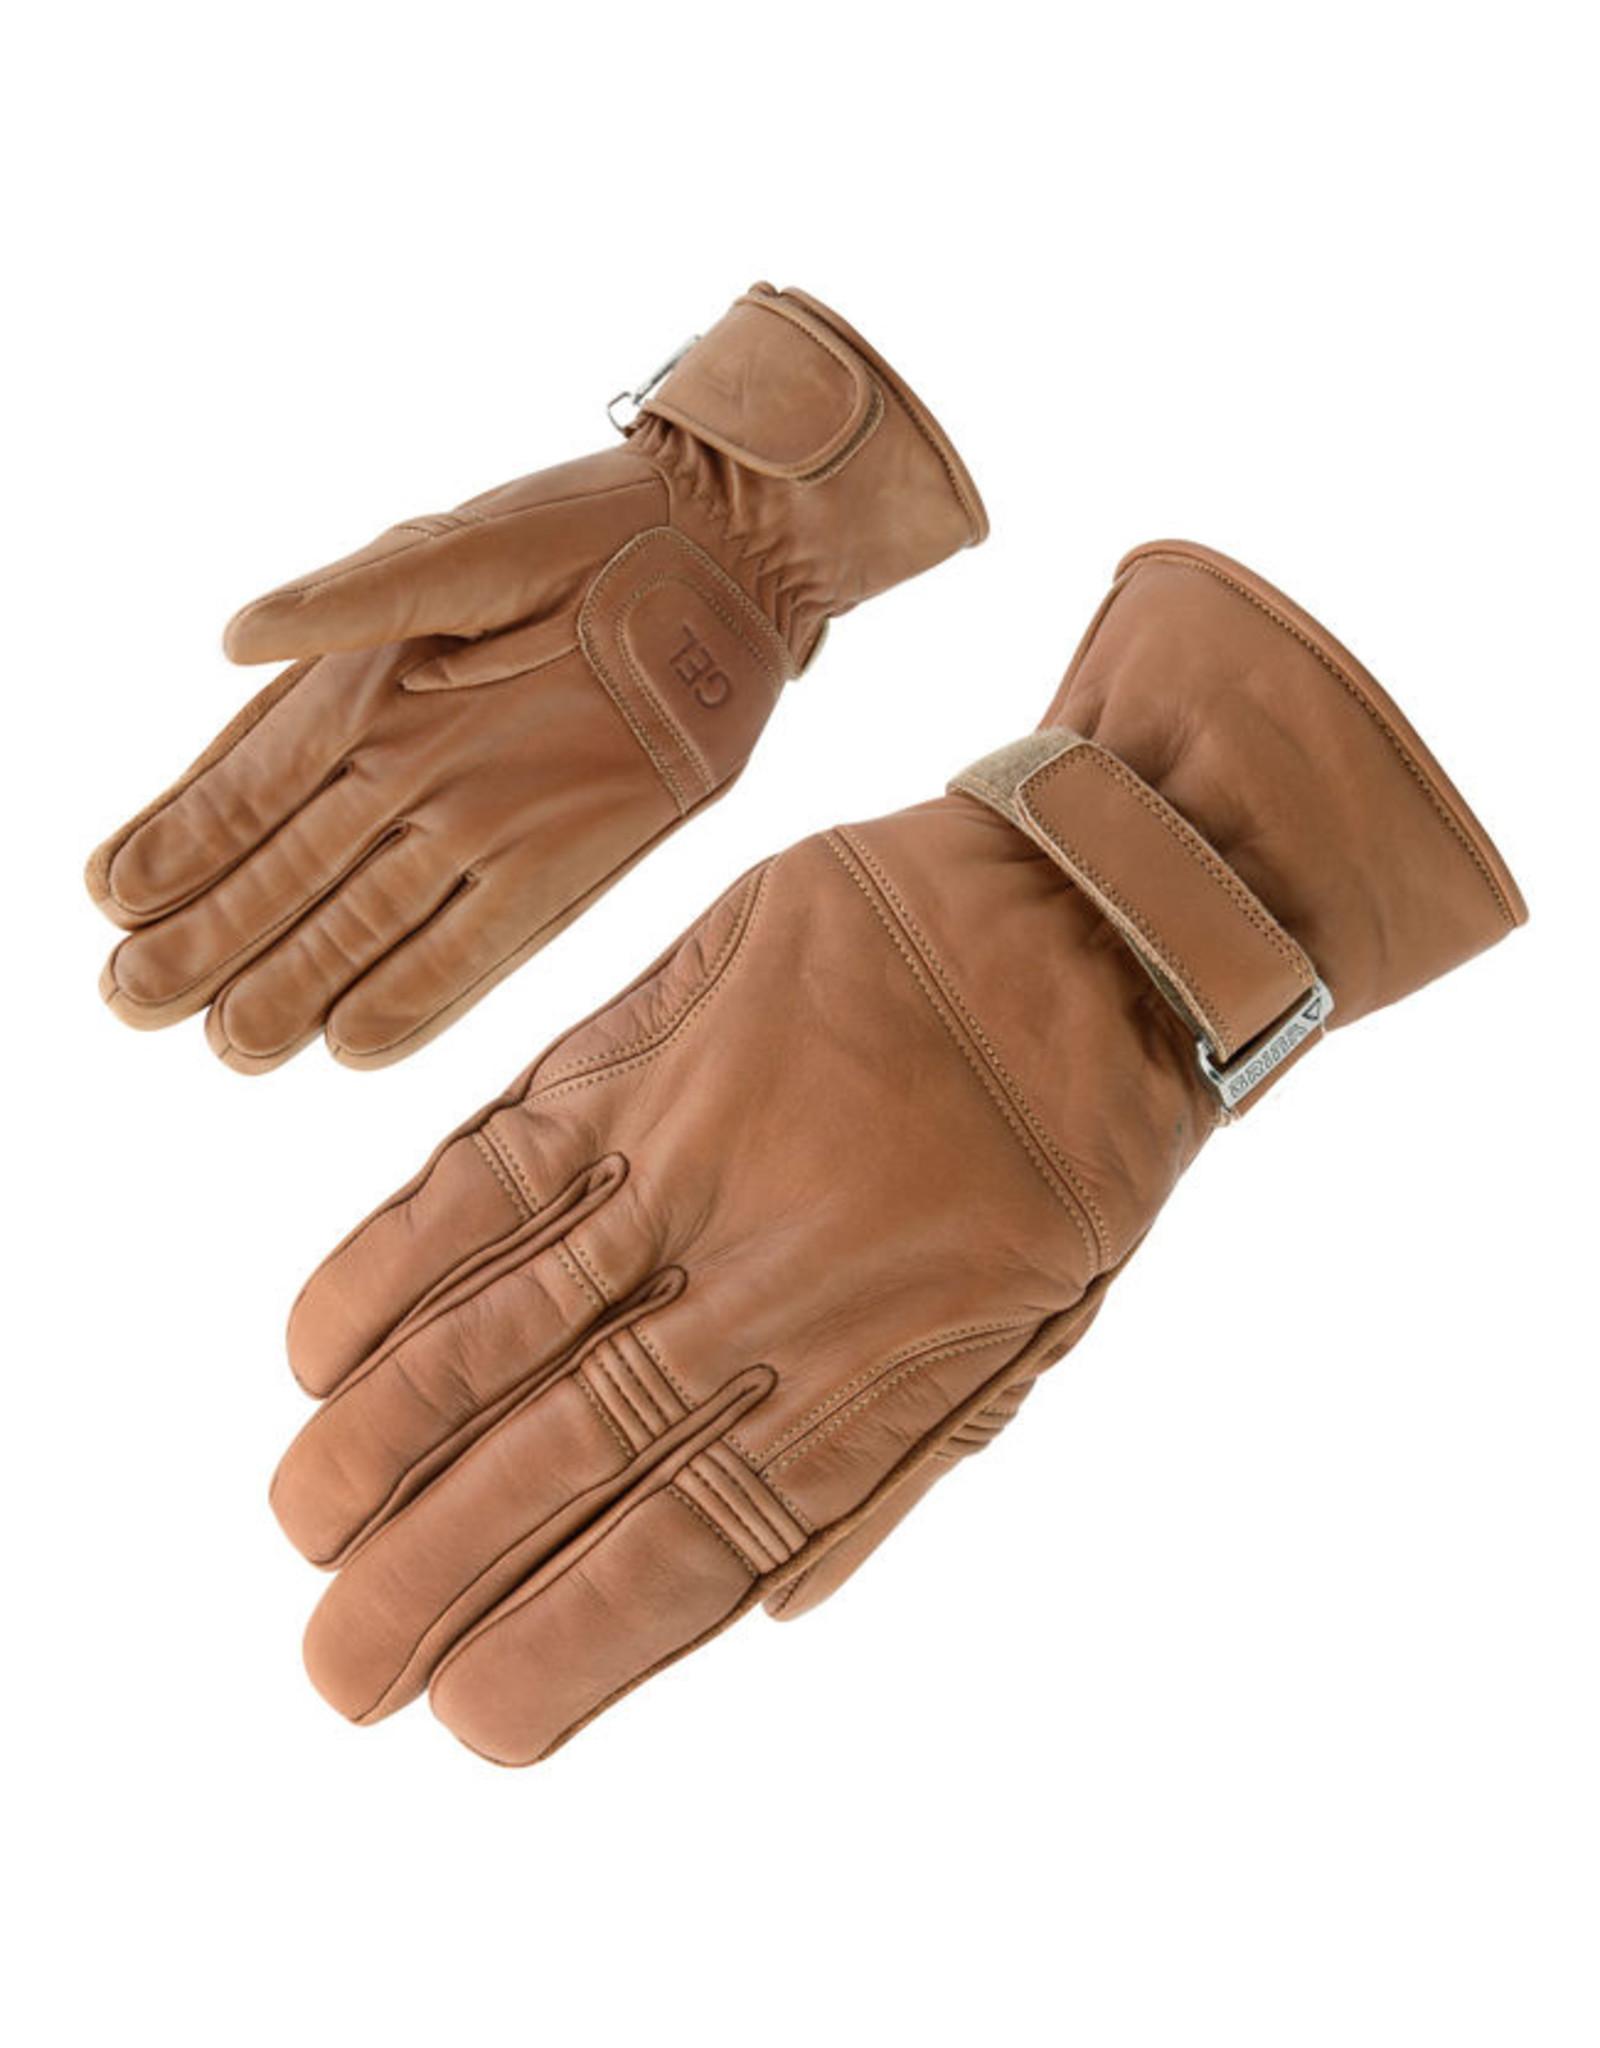 Orina ORINA Waterproof, padded leather gloves Waterproof